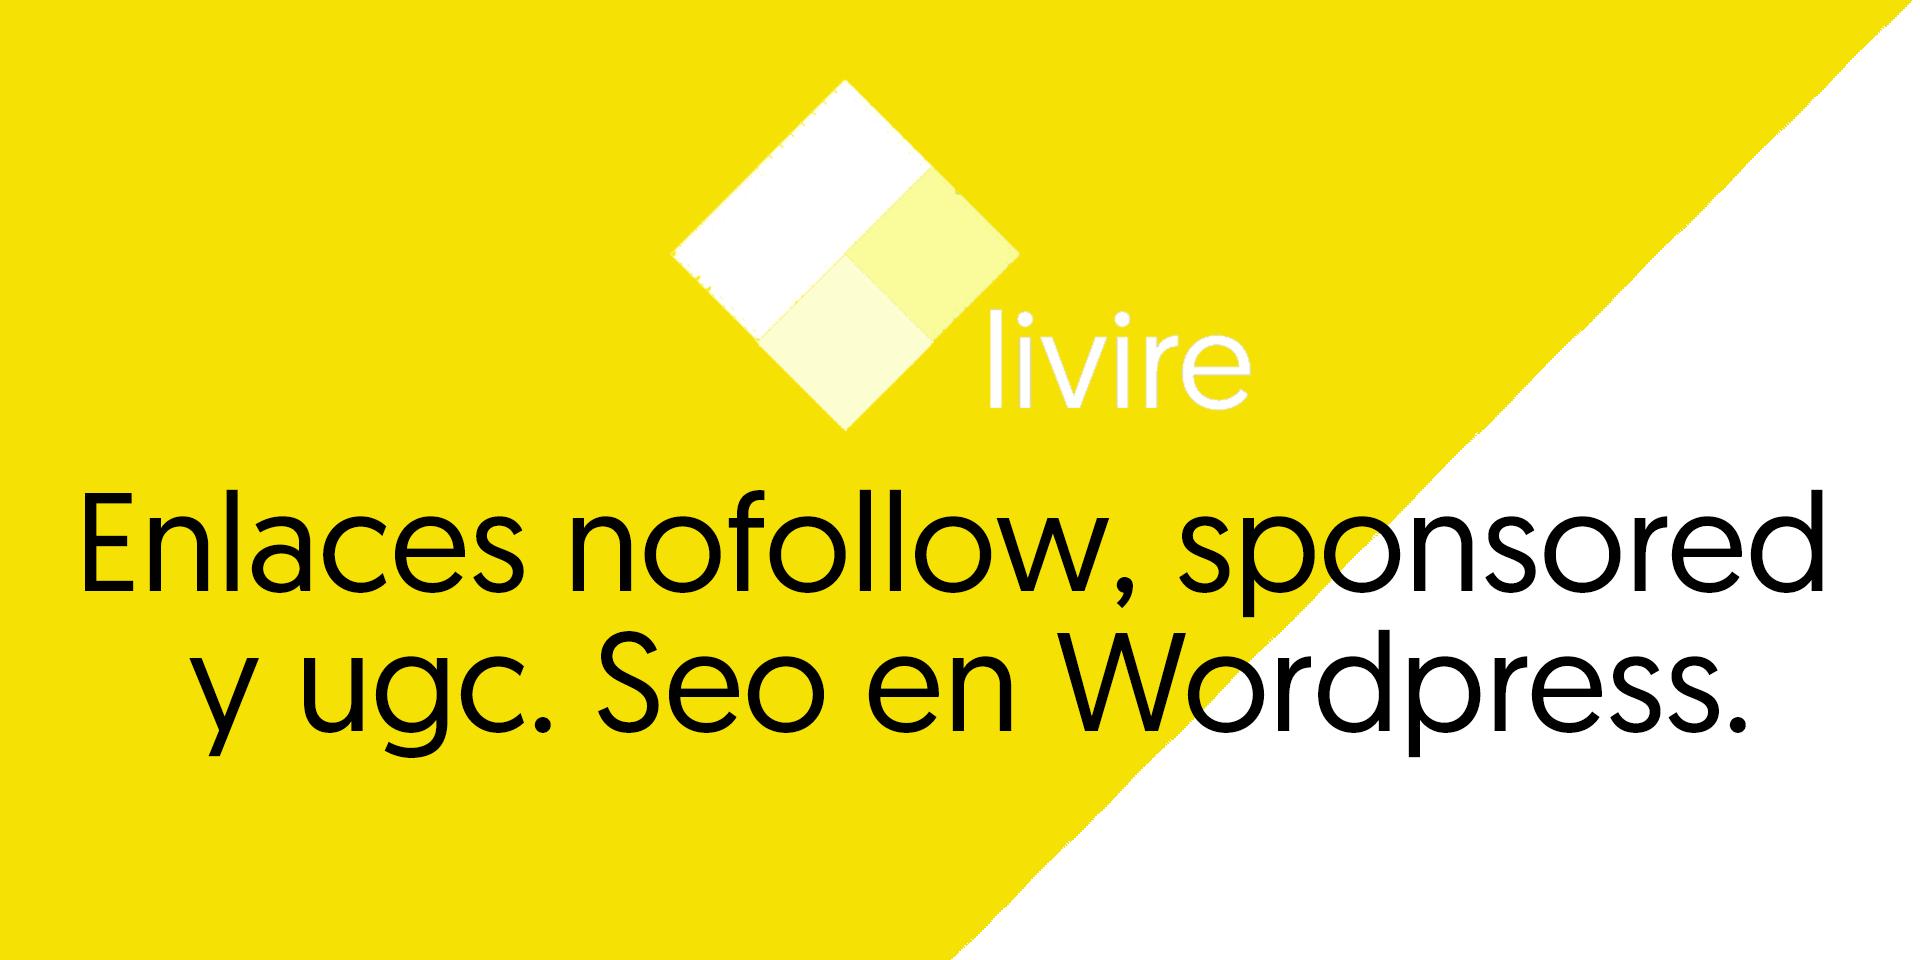 Enlaces nofollow, sponsored y ugc. Seo en WordPress.